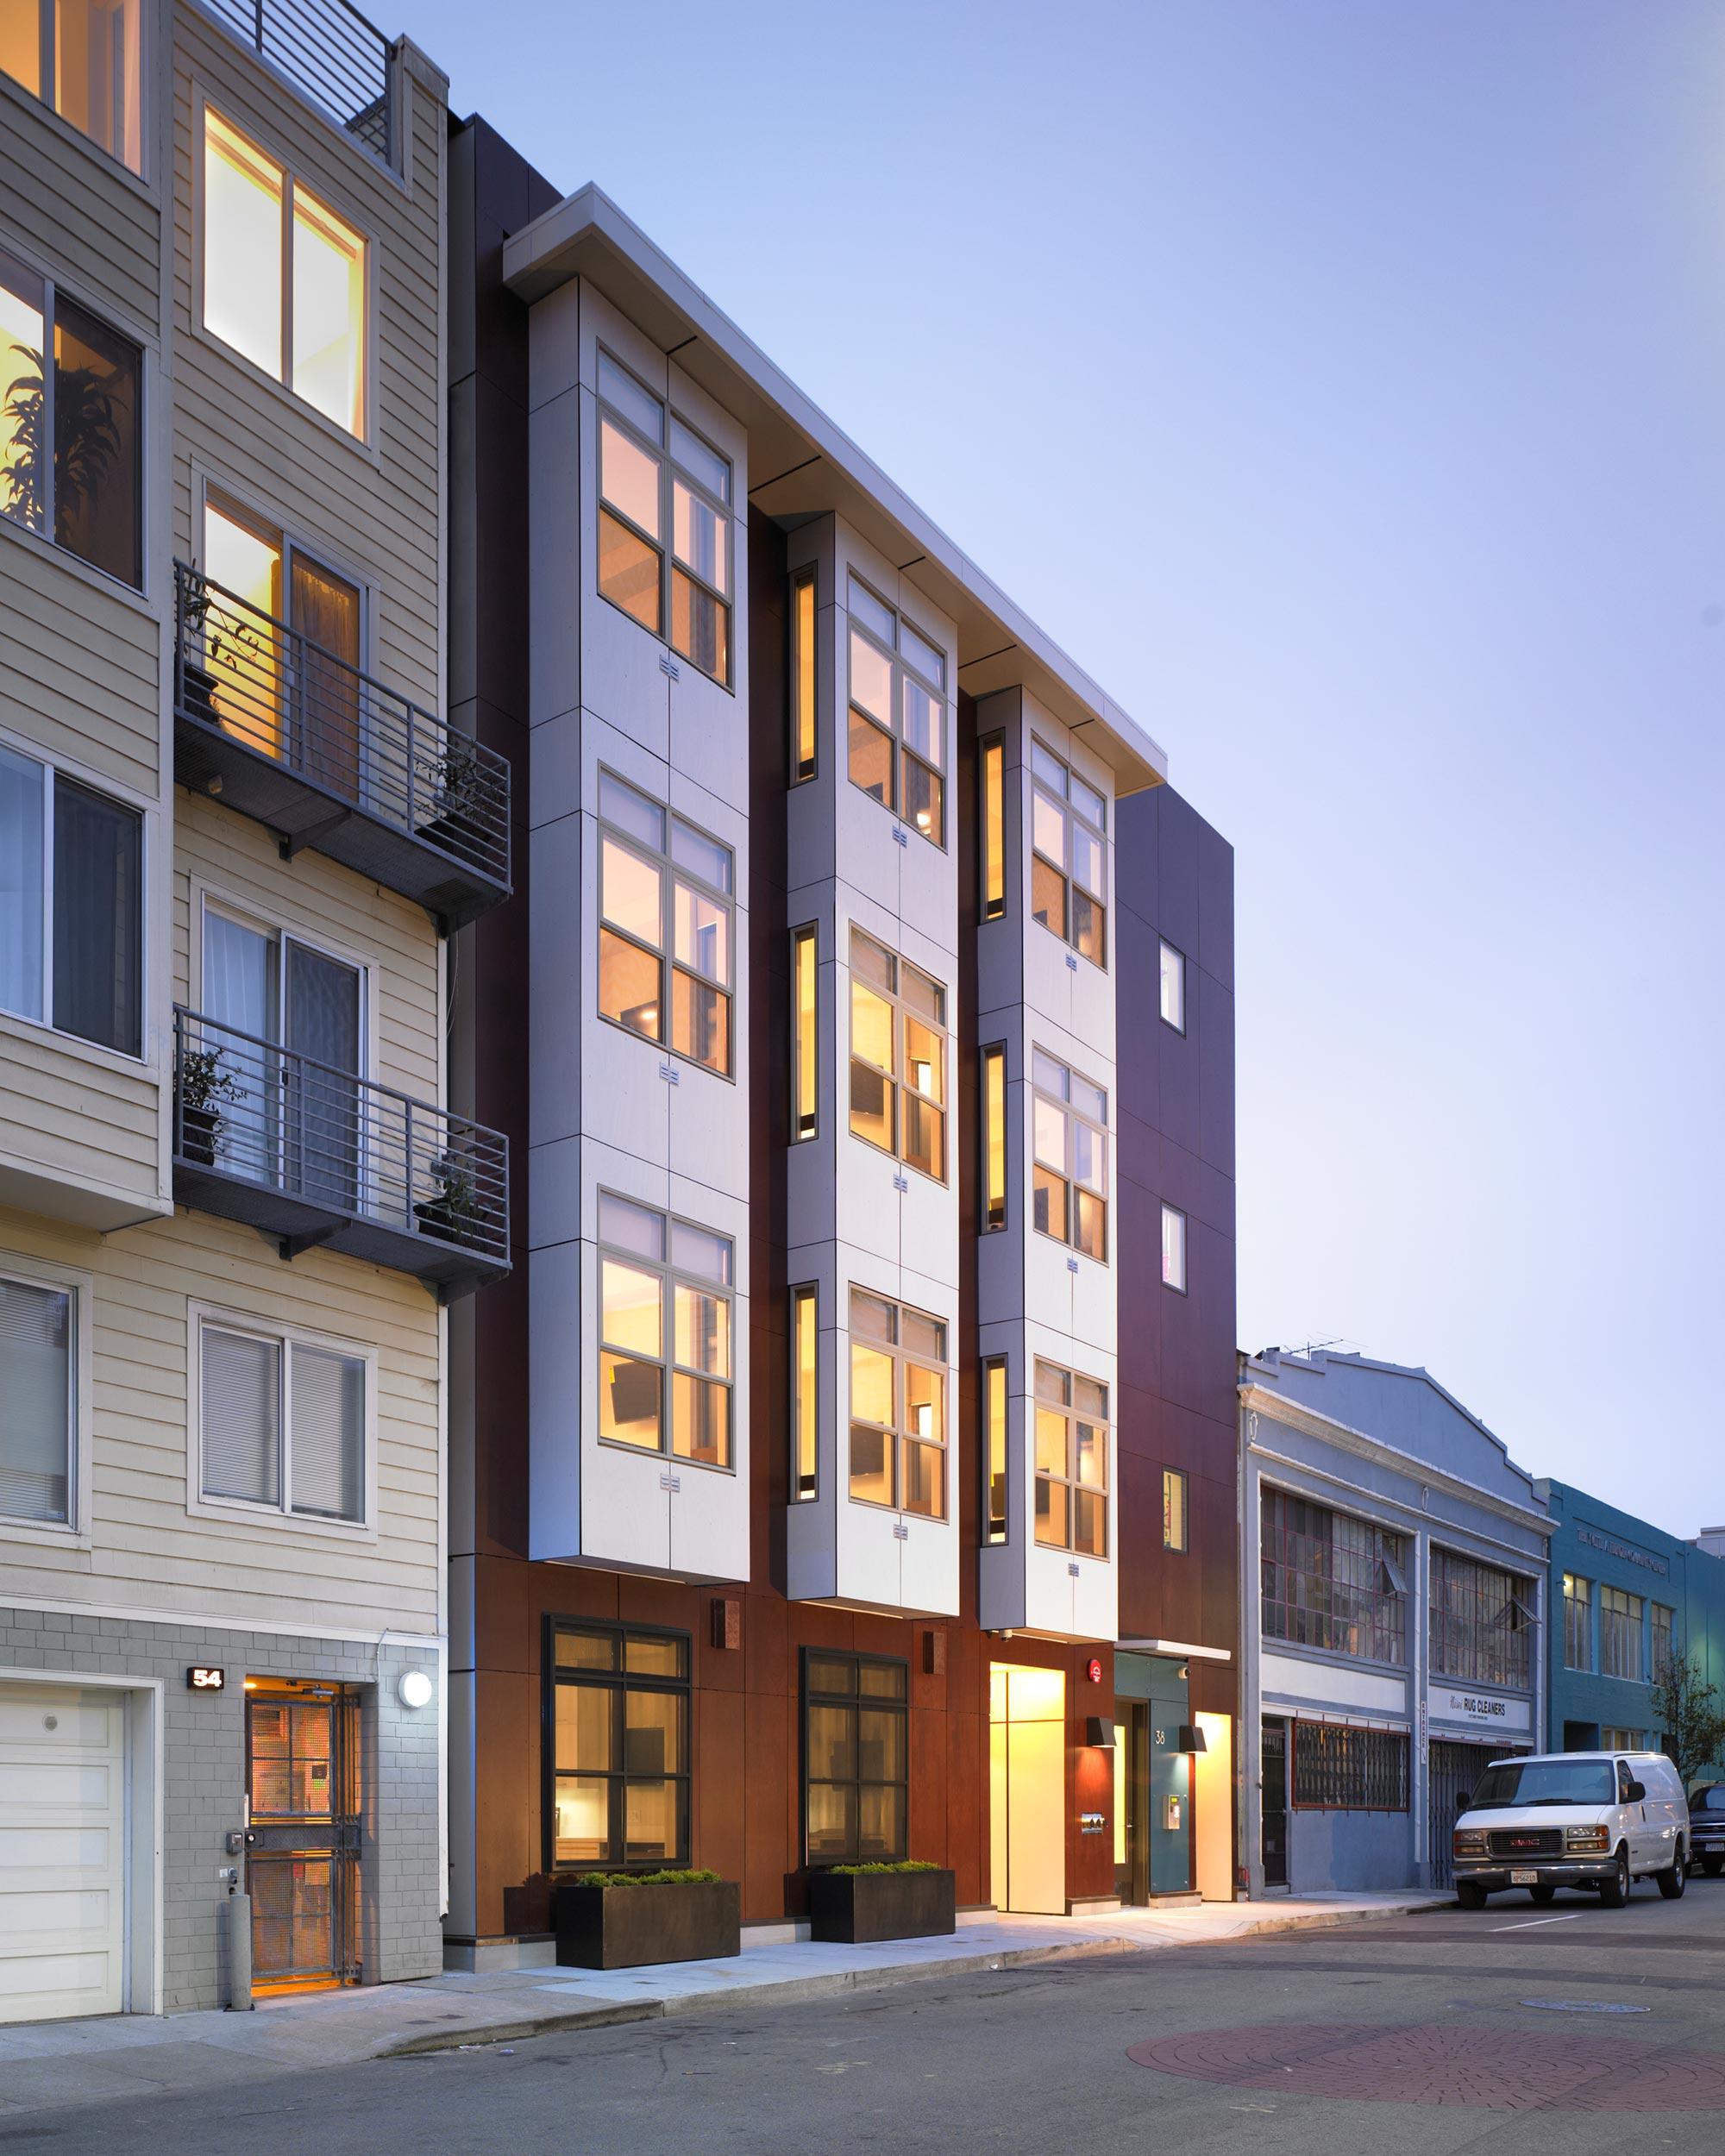 SmartSpace Harriet-San Francisco, CA-Lowney Architecture-1